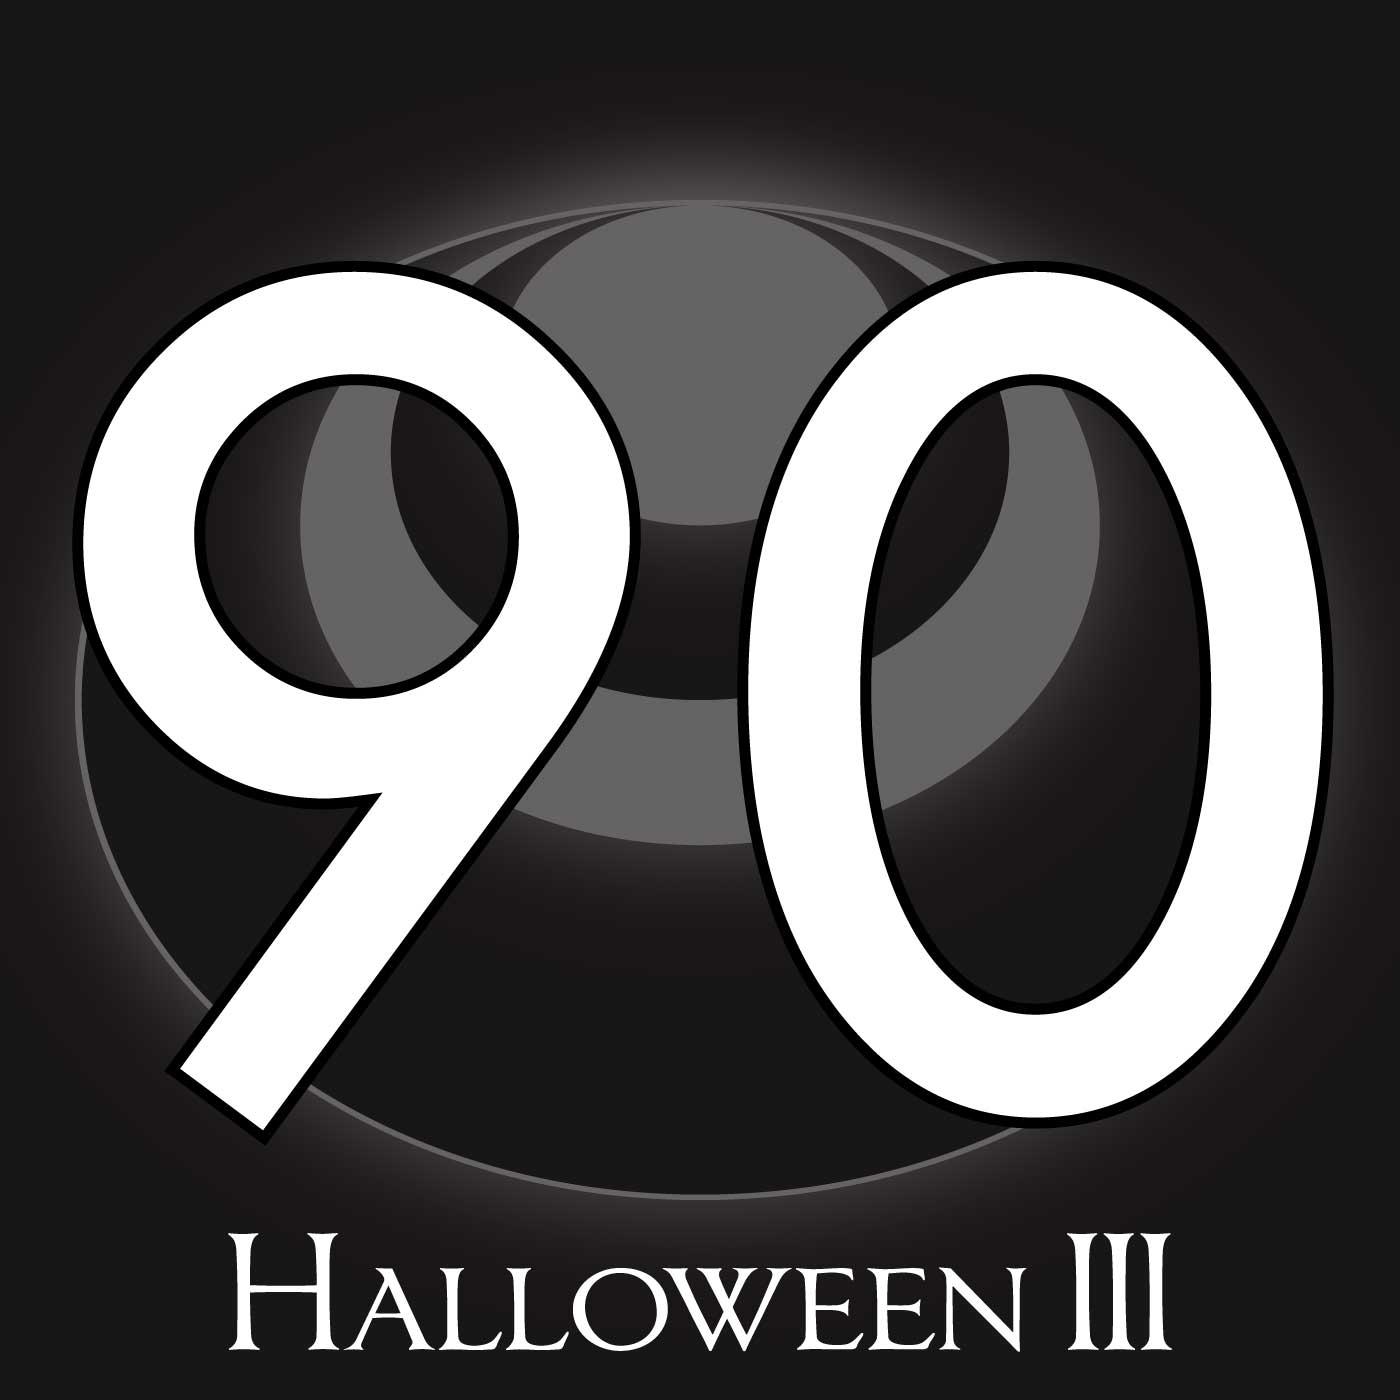 90 – Halloween III – Kakos Industries